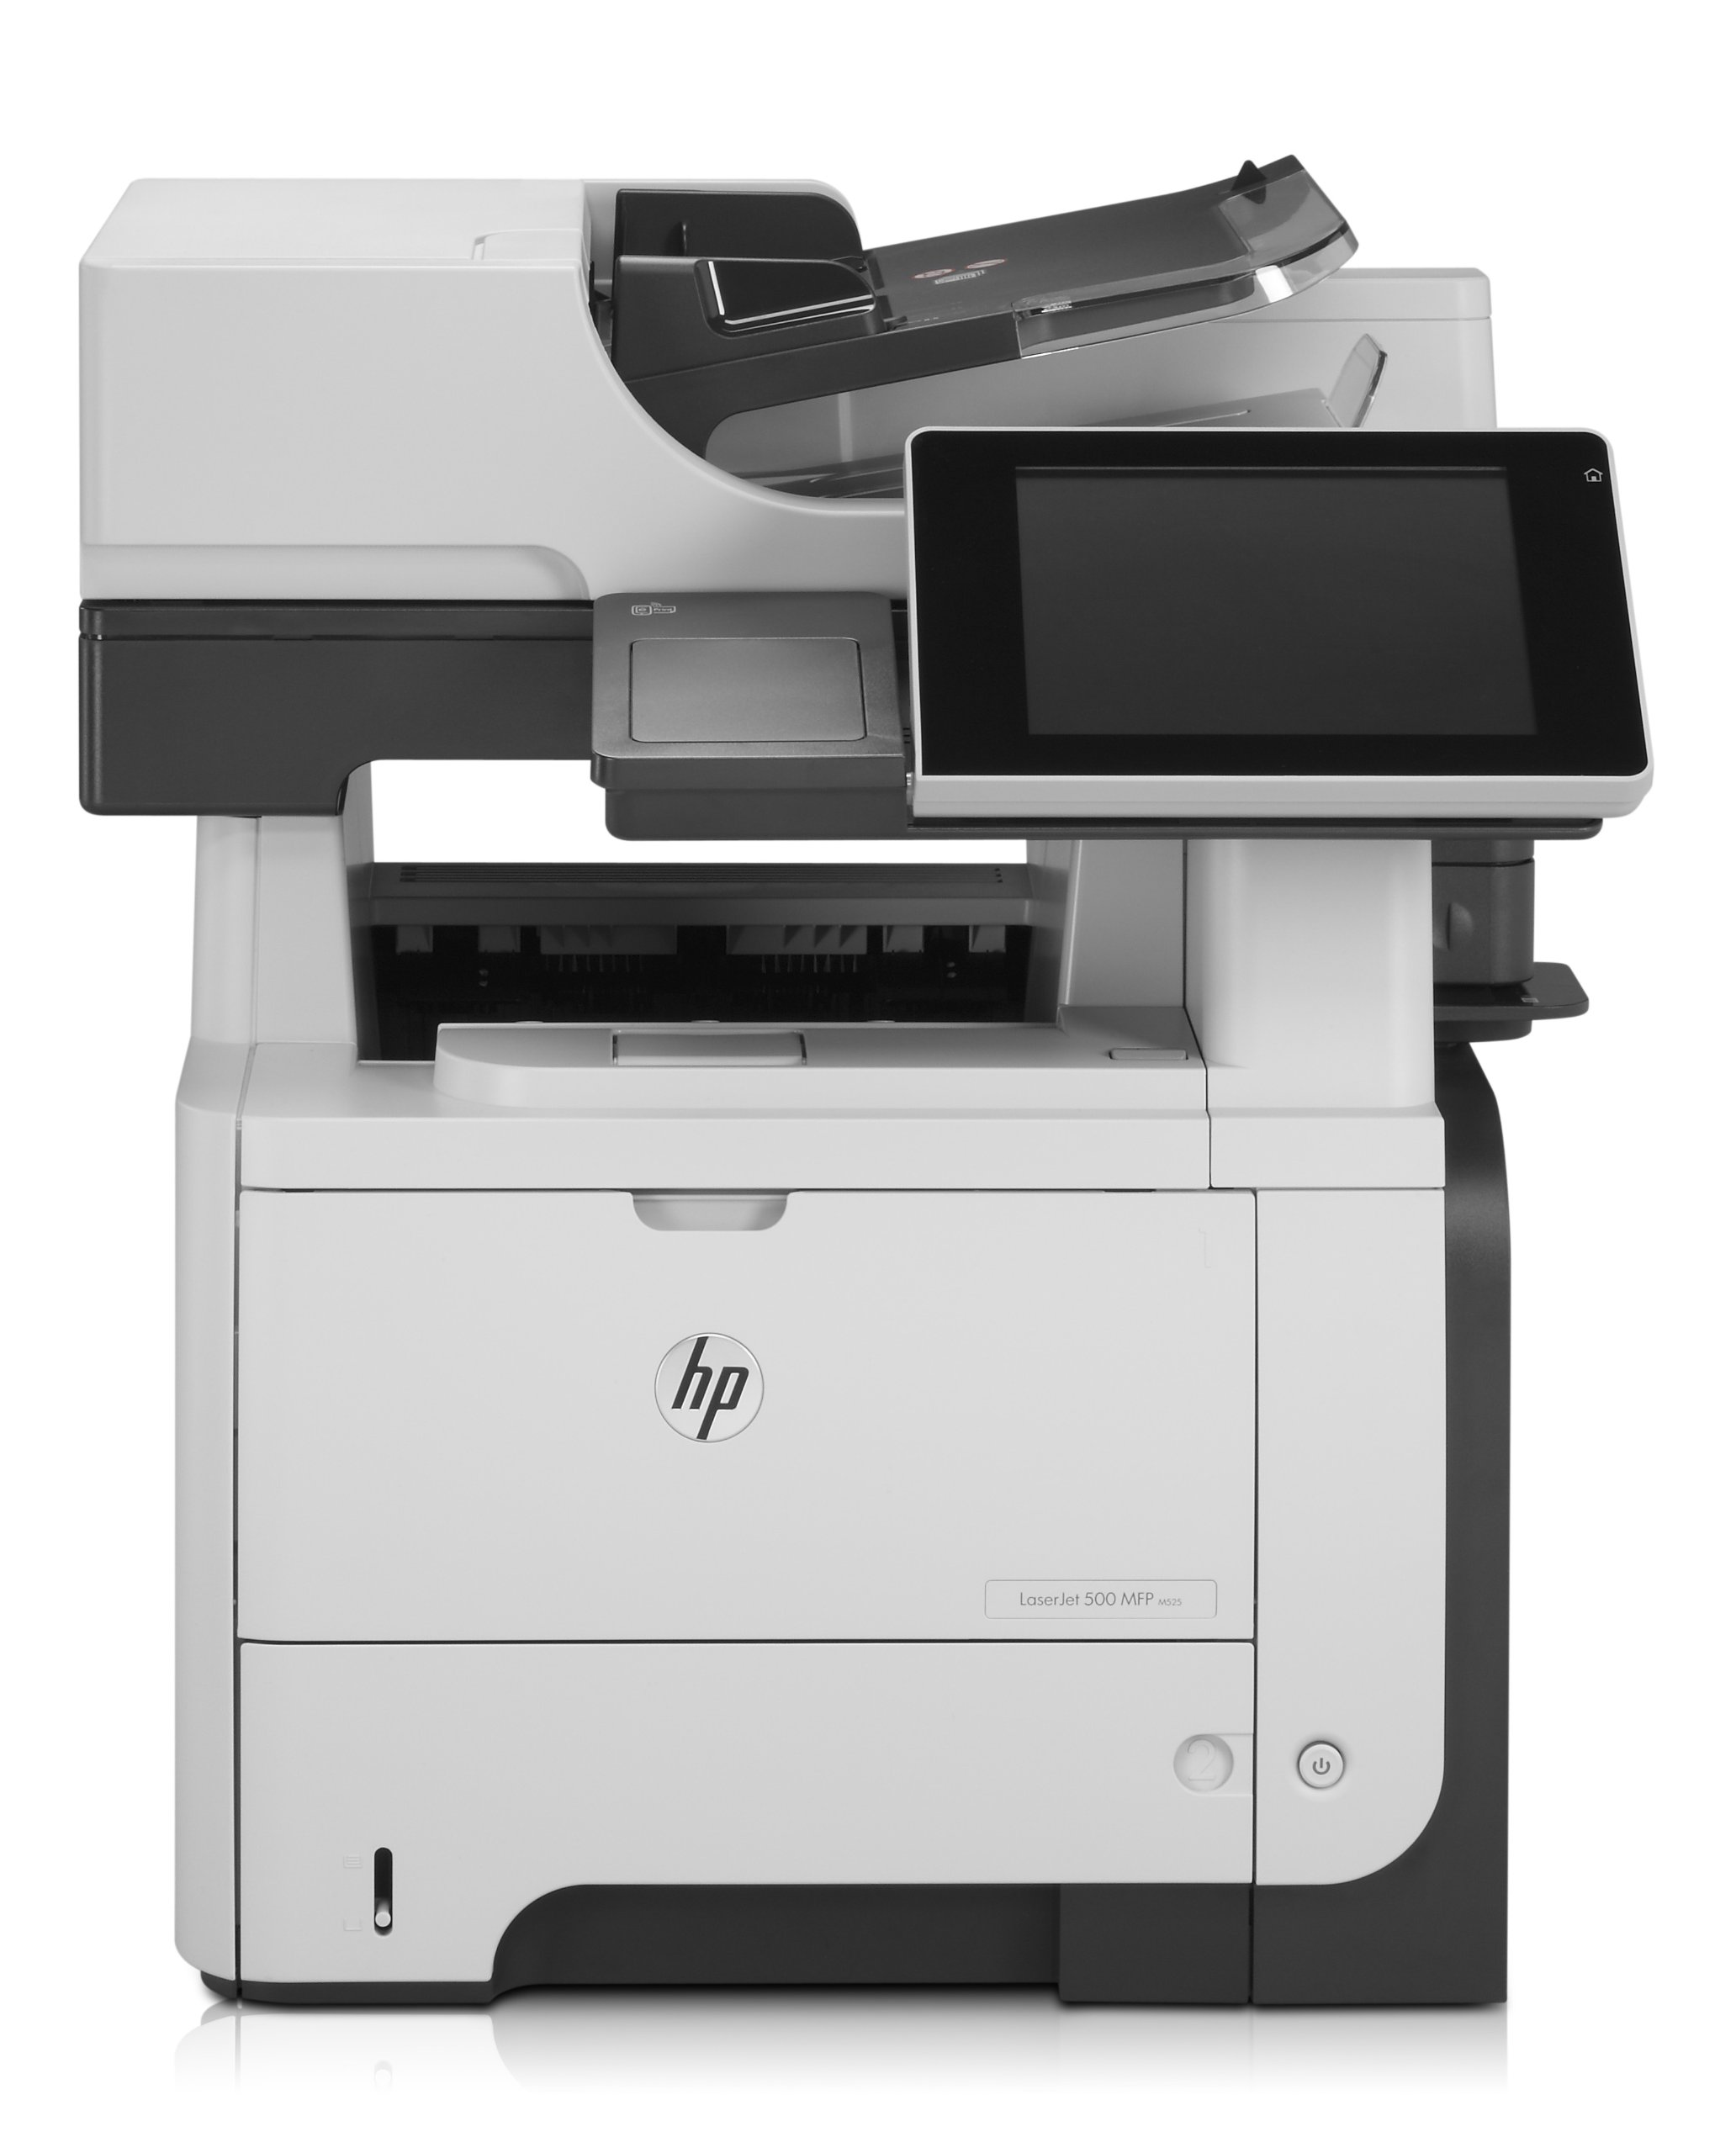 HP LSRJET 500 M525F MFP GREY/BLK CF117A